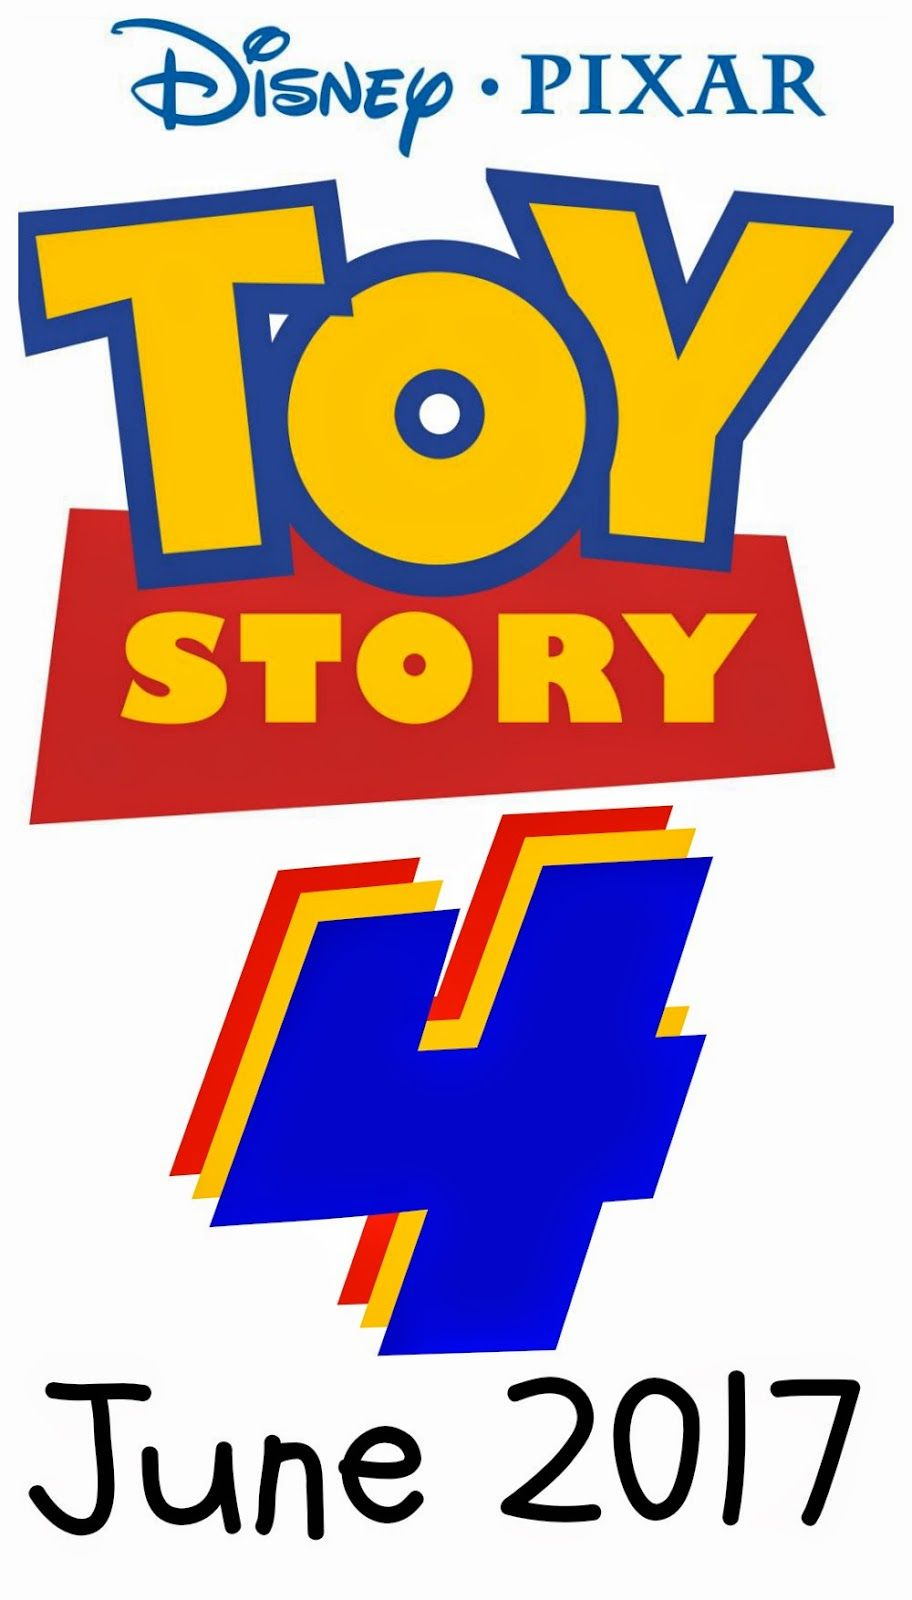 EPIC PIXAR ANNOUNCEMENT: Toy Story 4 Announced by Disney Pixar for ... for Disney Pixar Toy Story Logo  83fiz